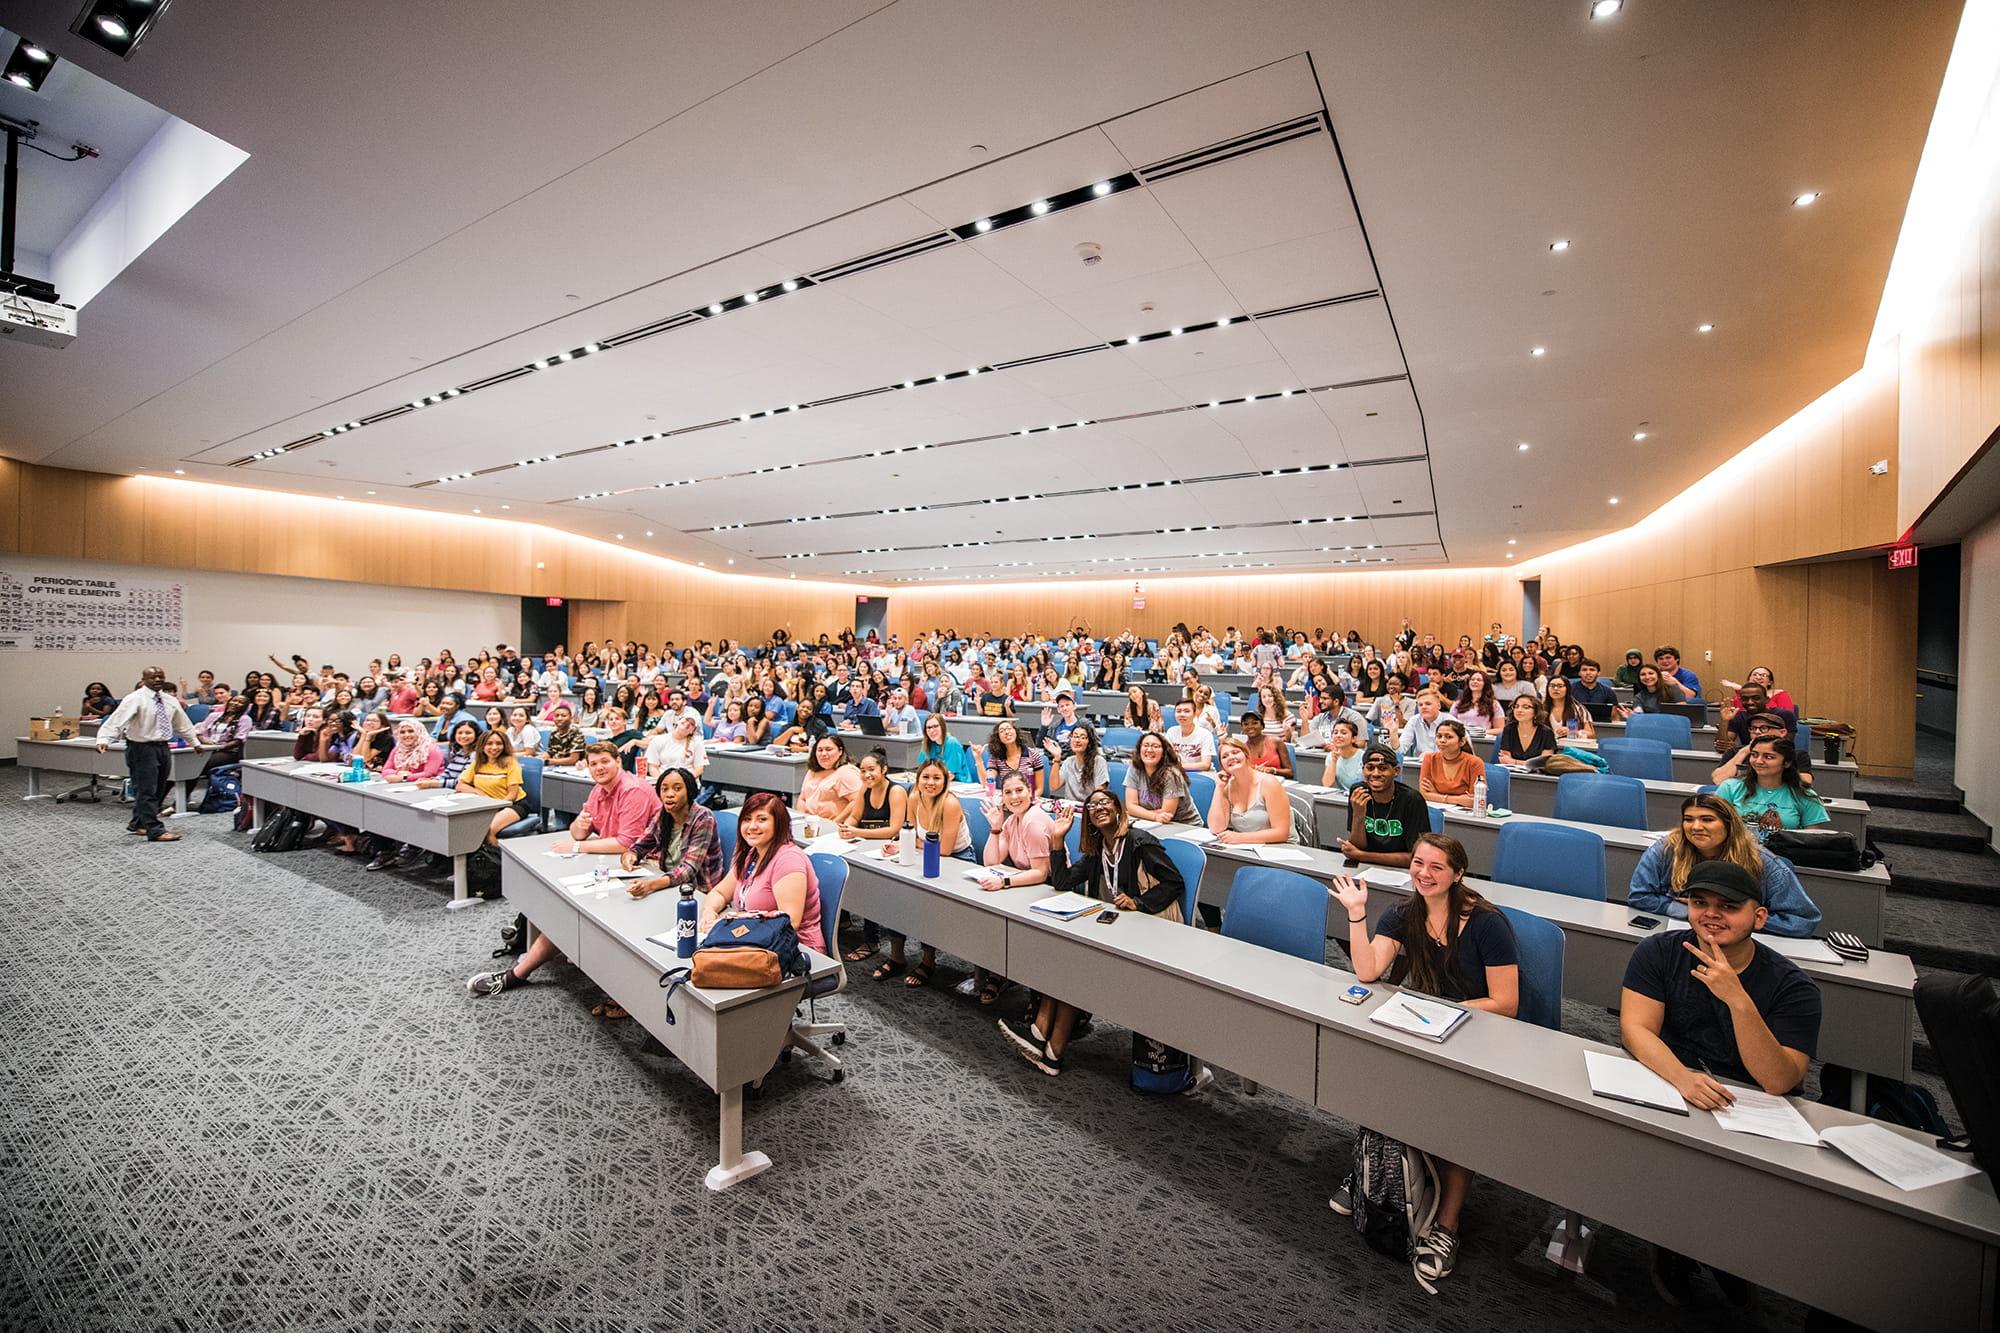 Student enrollment increased at UTA this fall.